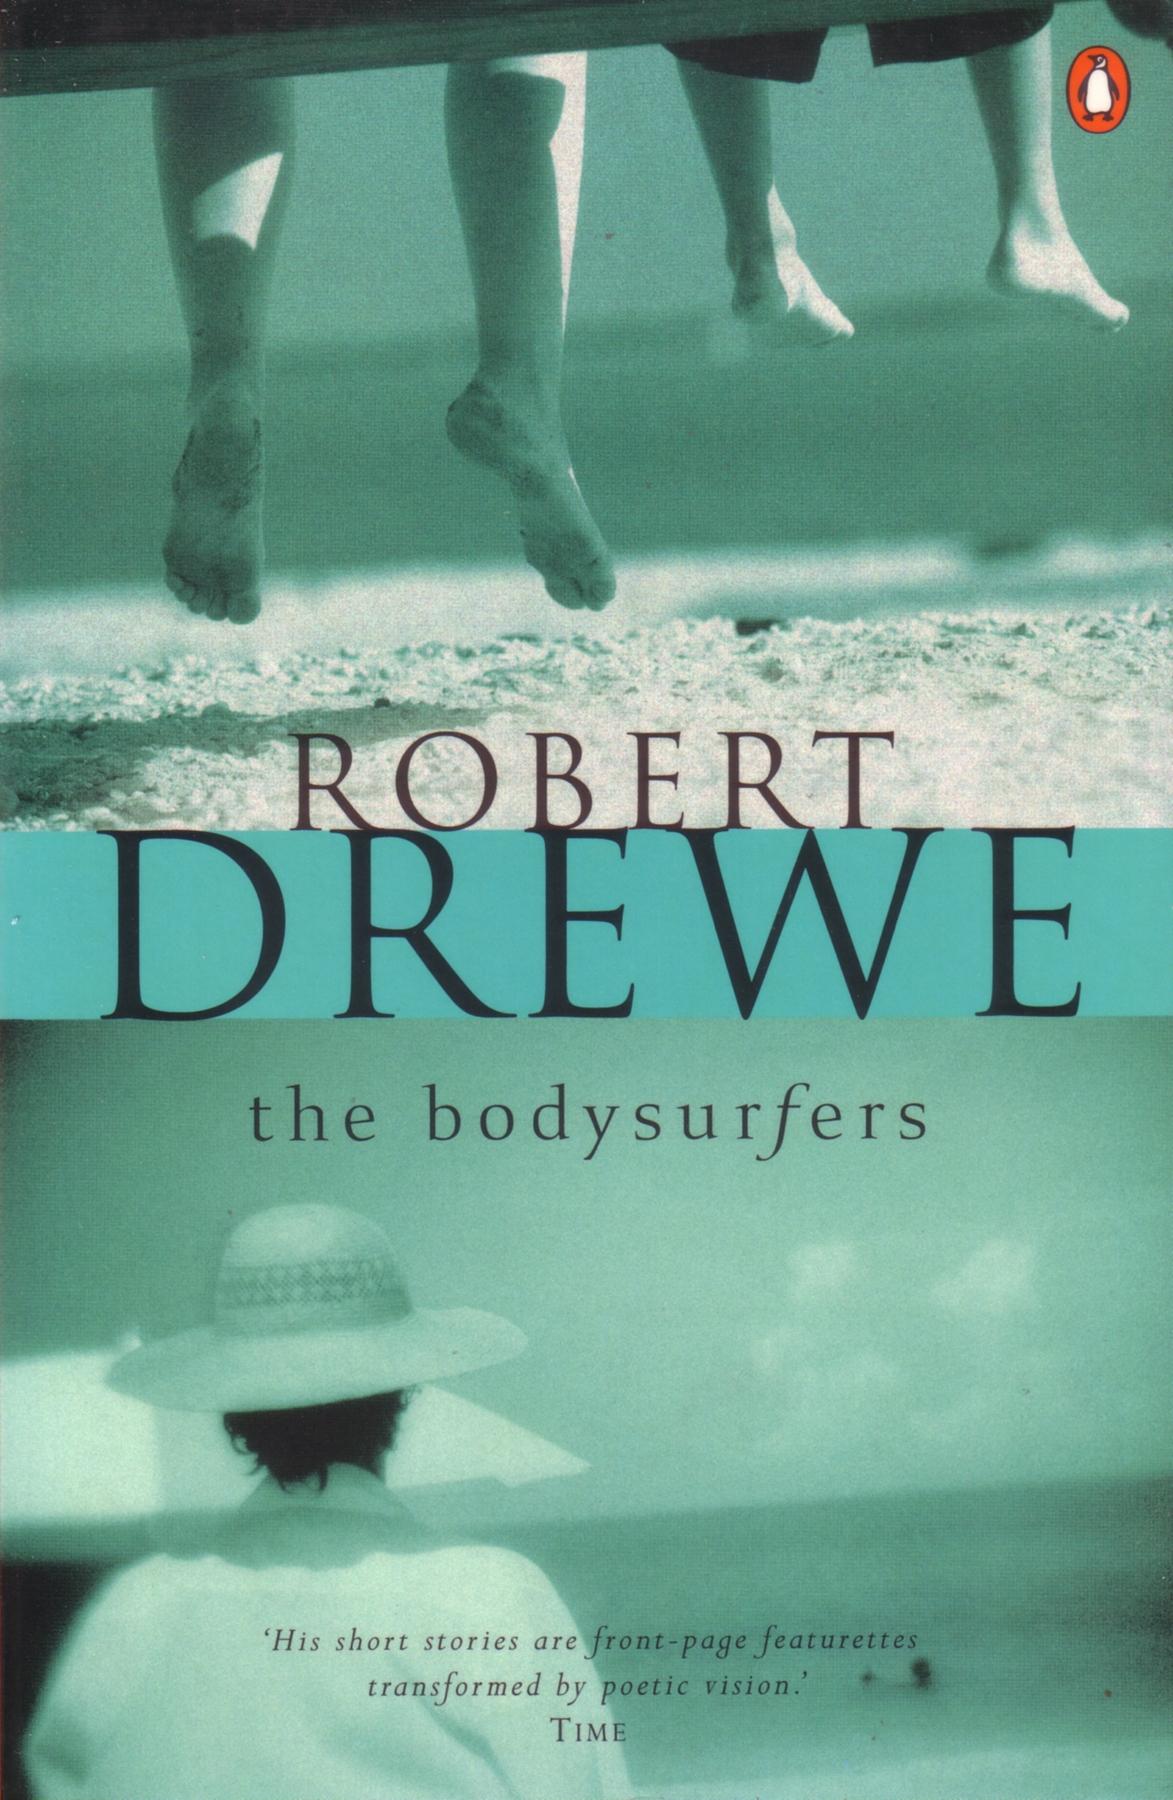 robert drewe Robert drewe's wiki: robert duncan drewe is an australian novelist, non-fiction and short story writerbiographyrobert drewe was born on 9 january 1943 in melbourne, victoria.